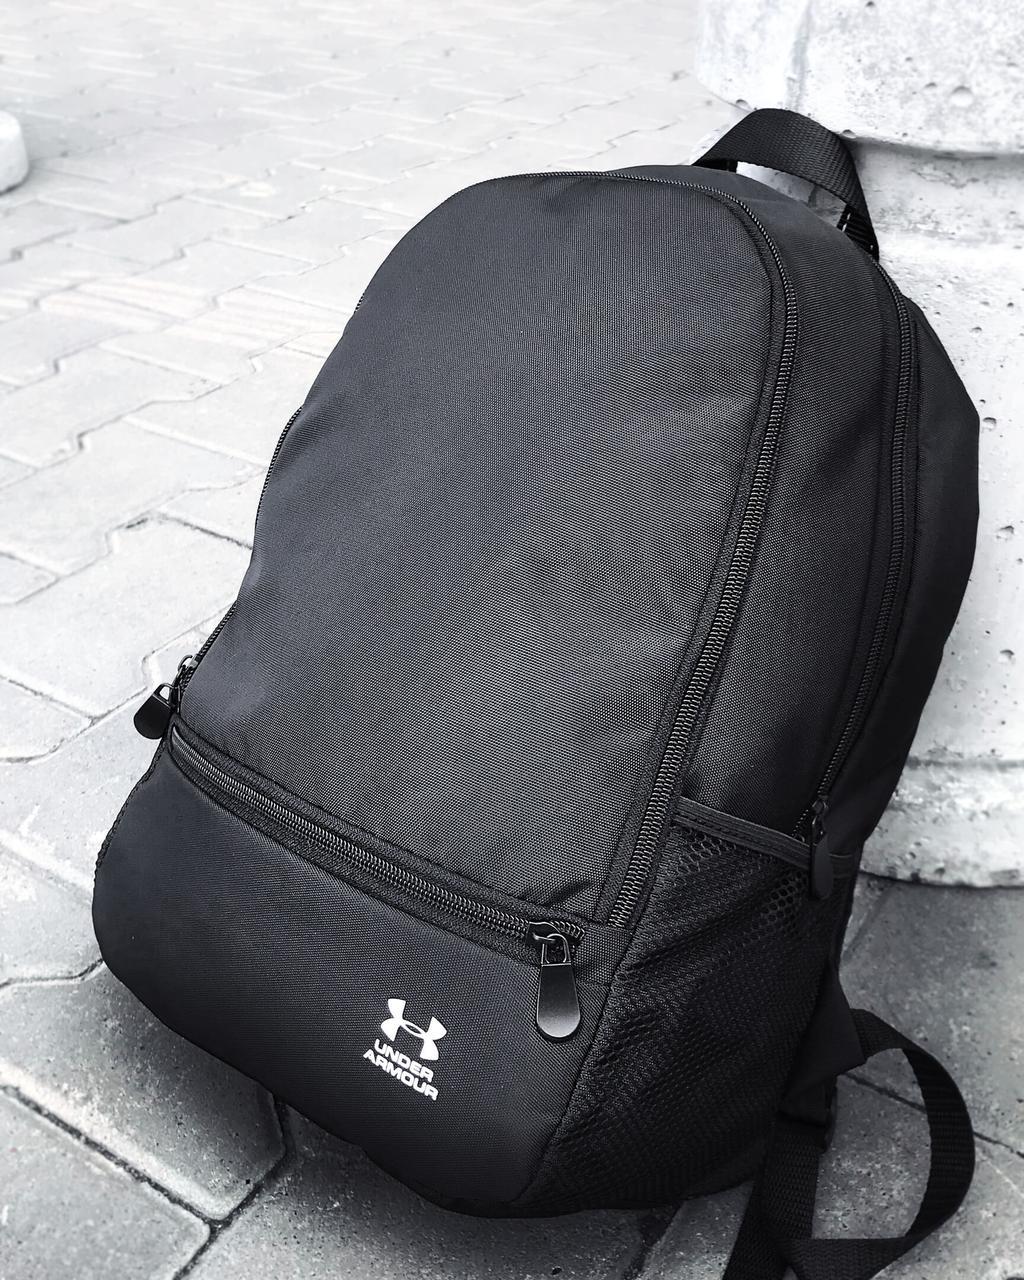 Рюкзак Under Armour черного цвета